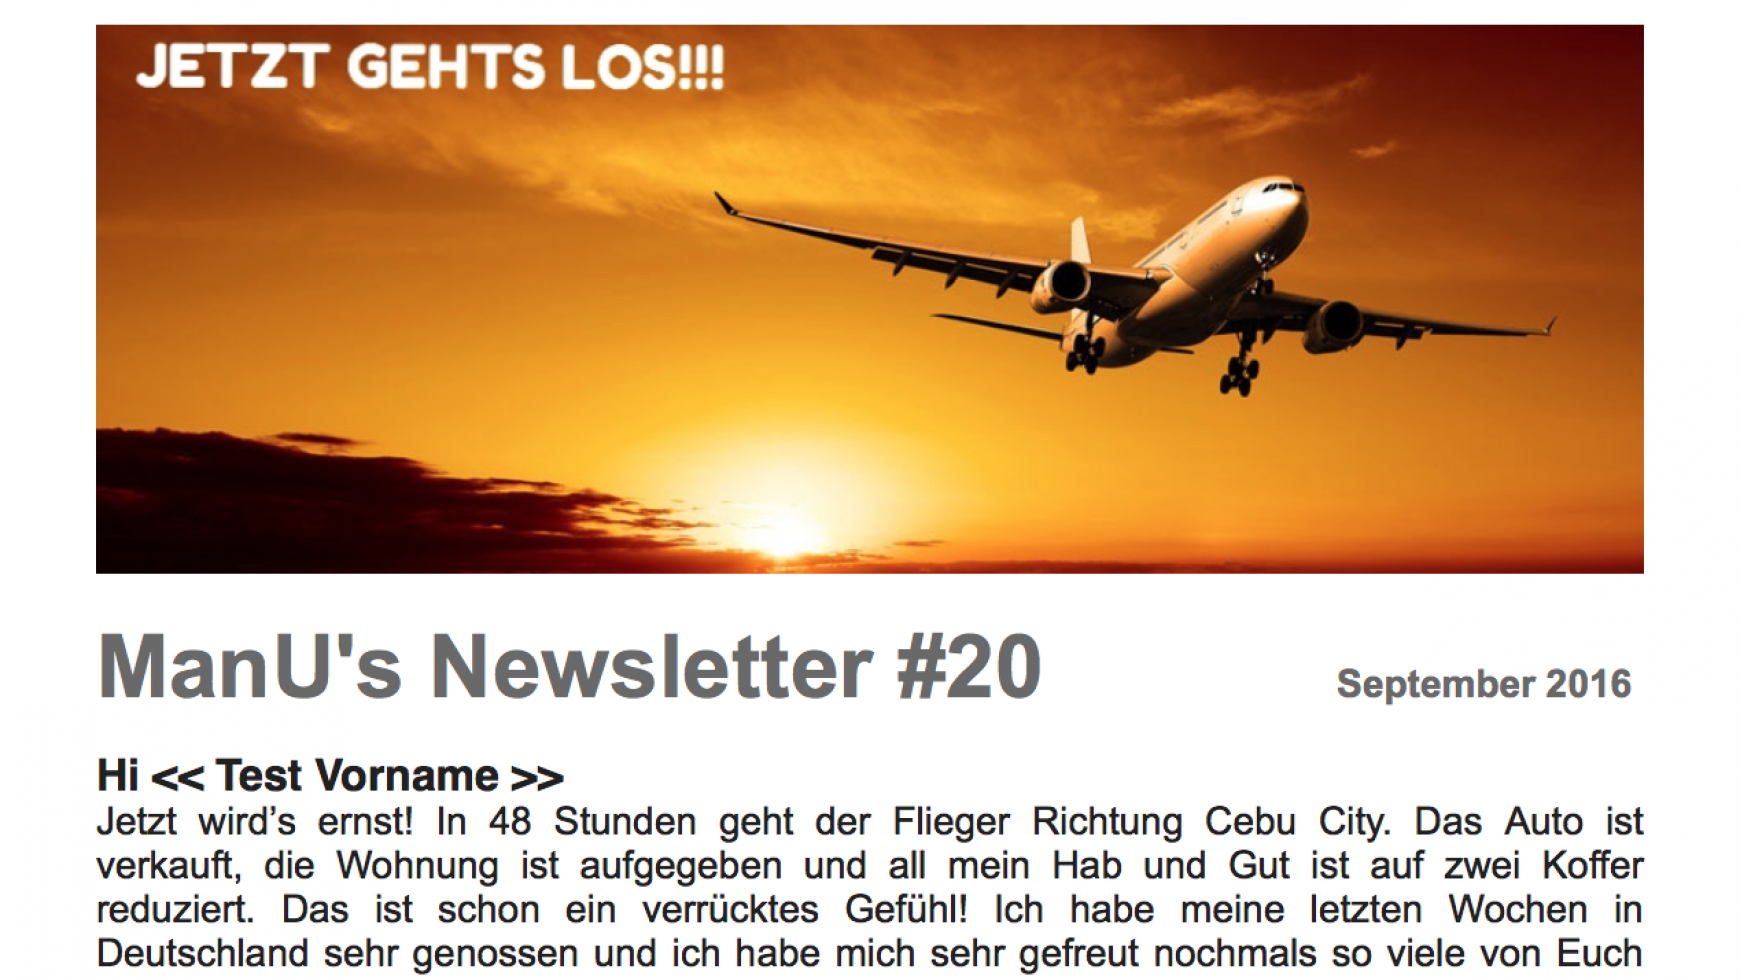 ManU's Newsletter #20